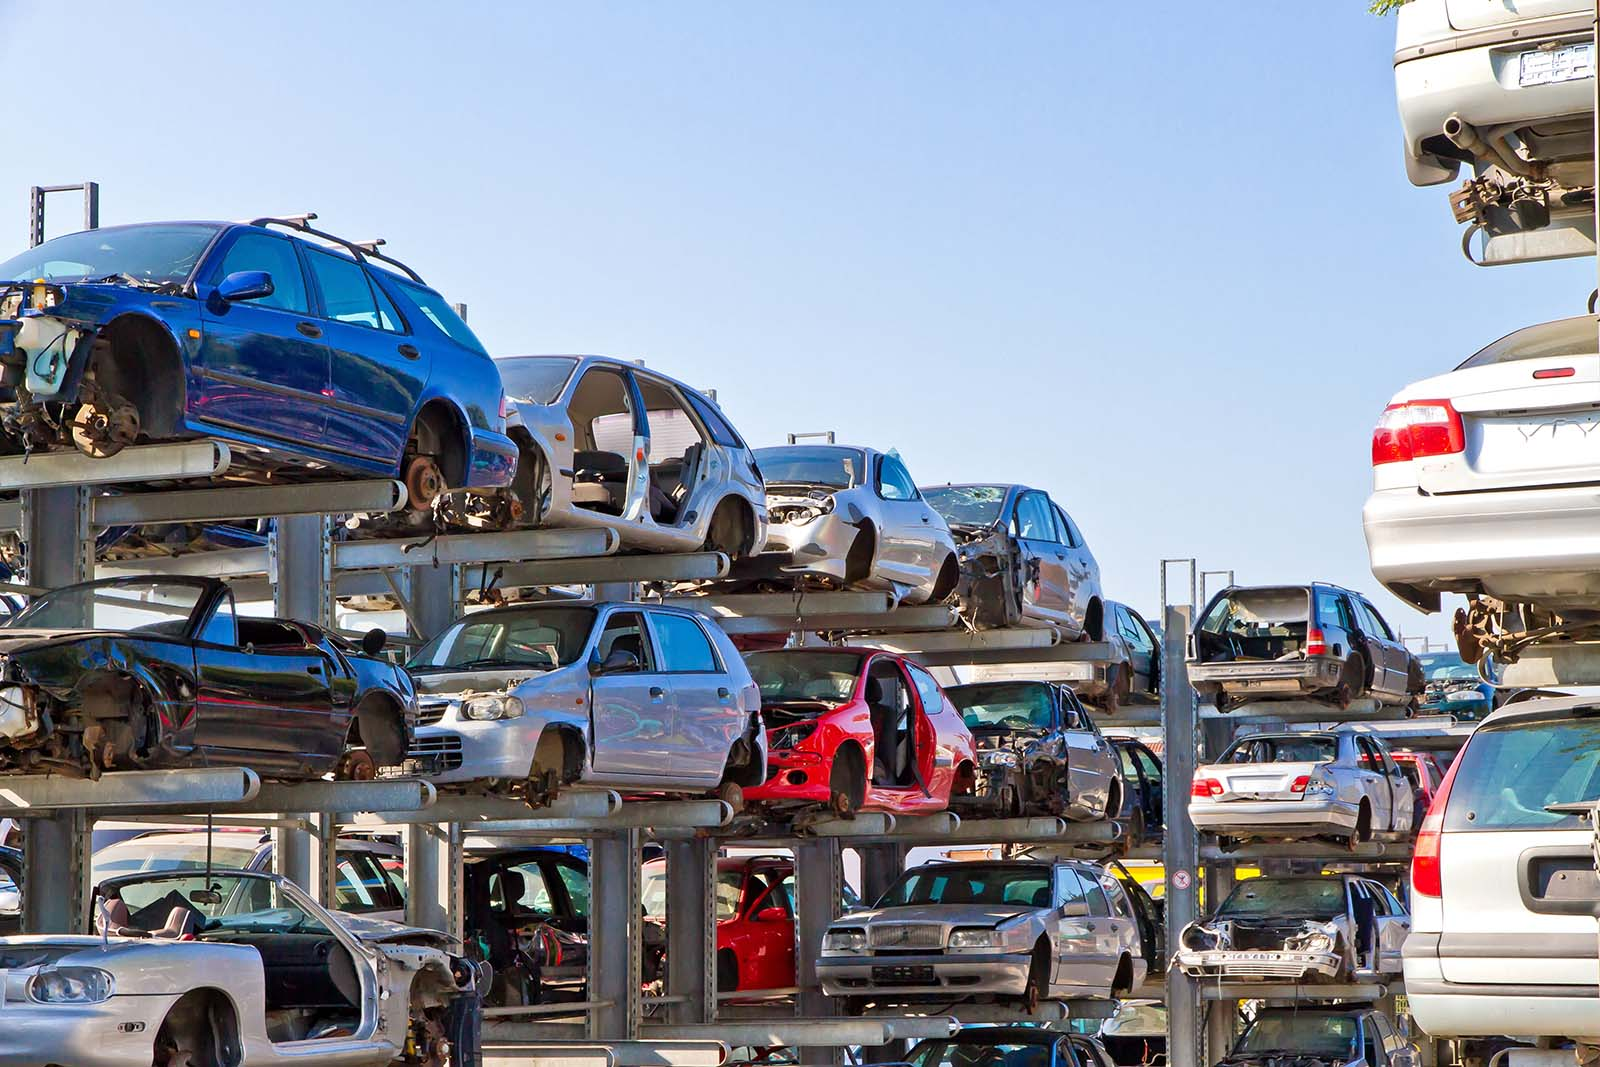 Vi är er bilskrot i Enköping. Kontakta vår bilskrot i Enköping för att skrota bilen.